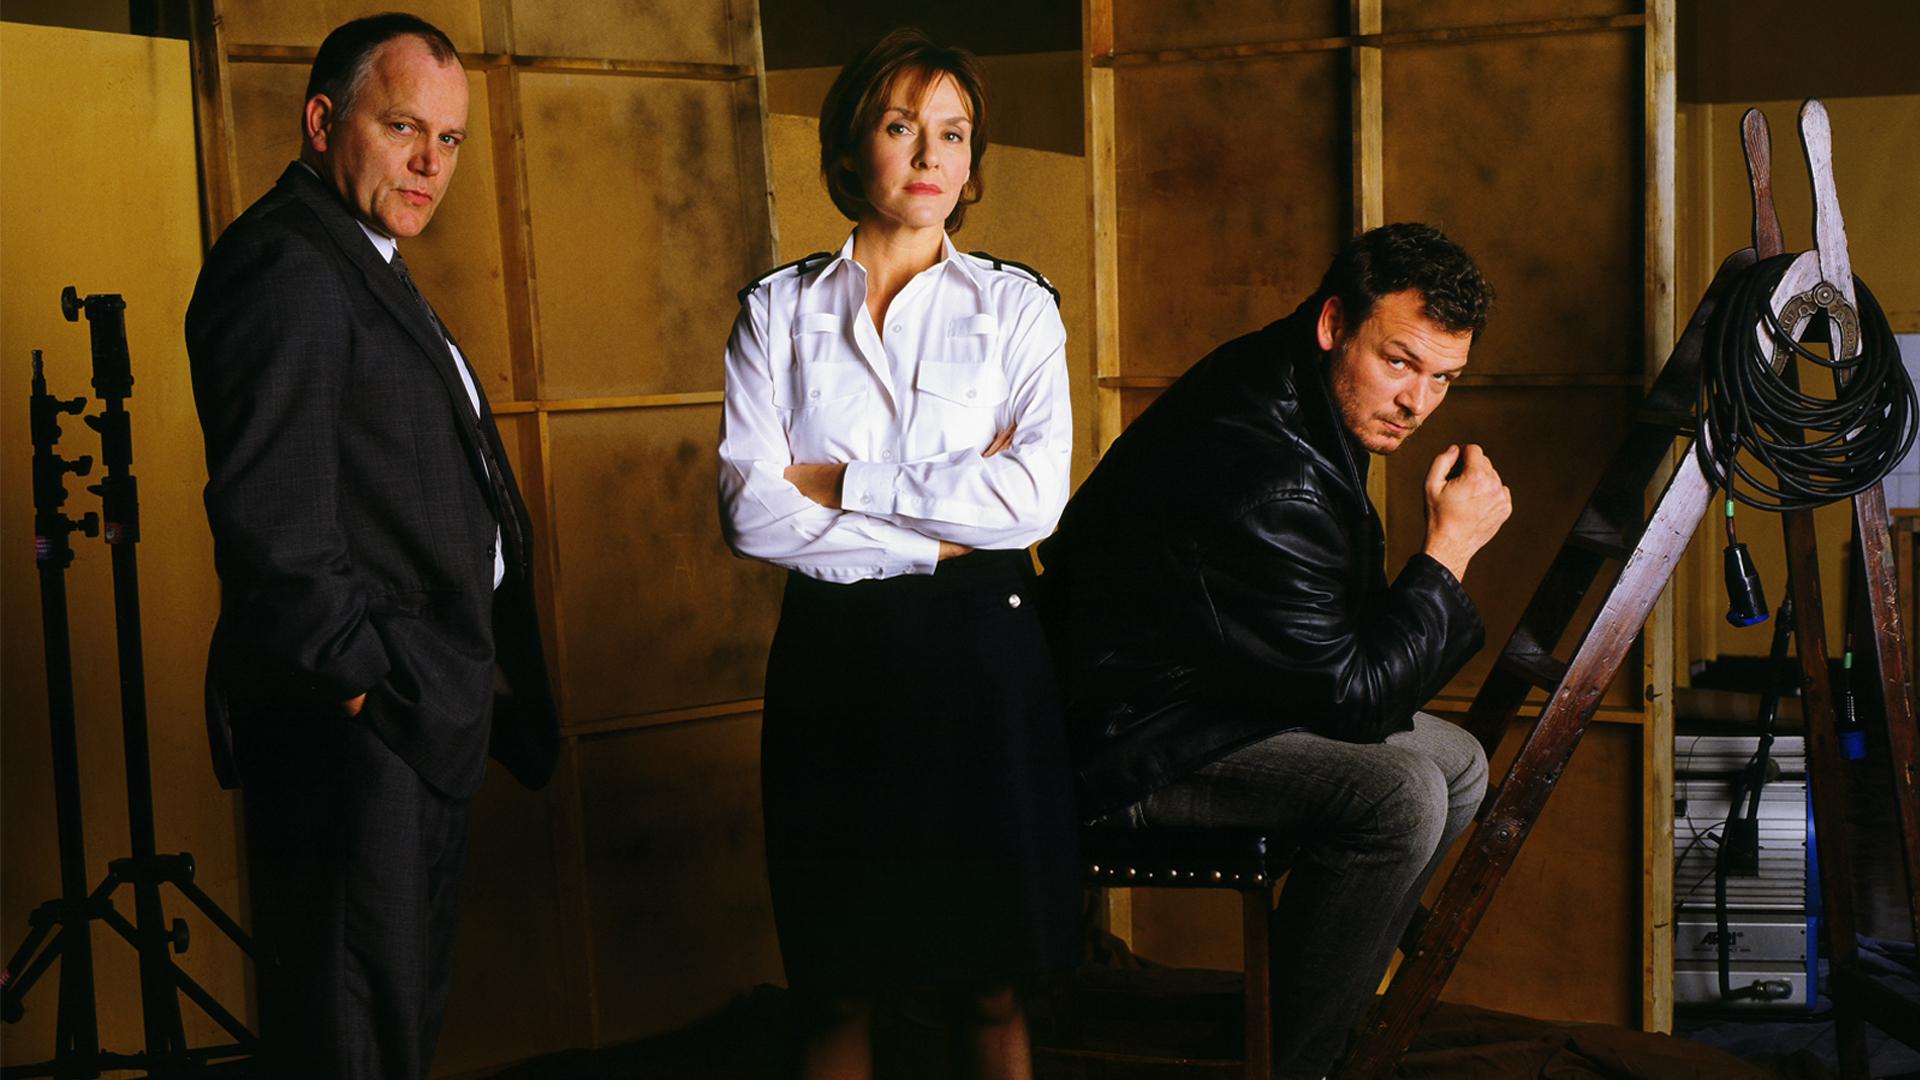 The Commander - Season 3